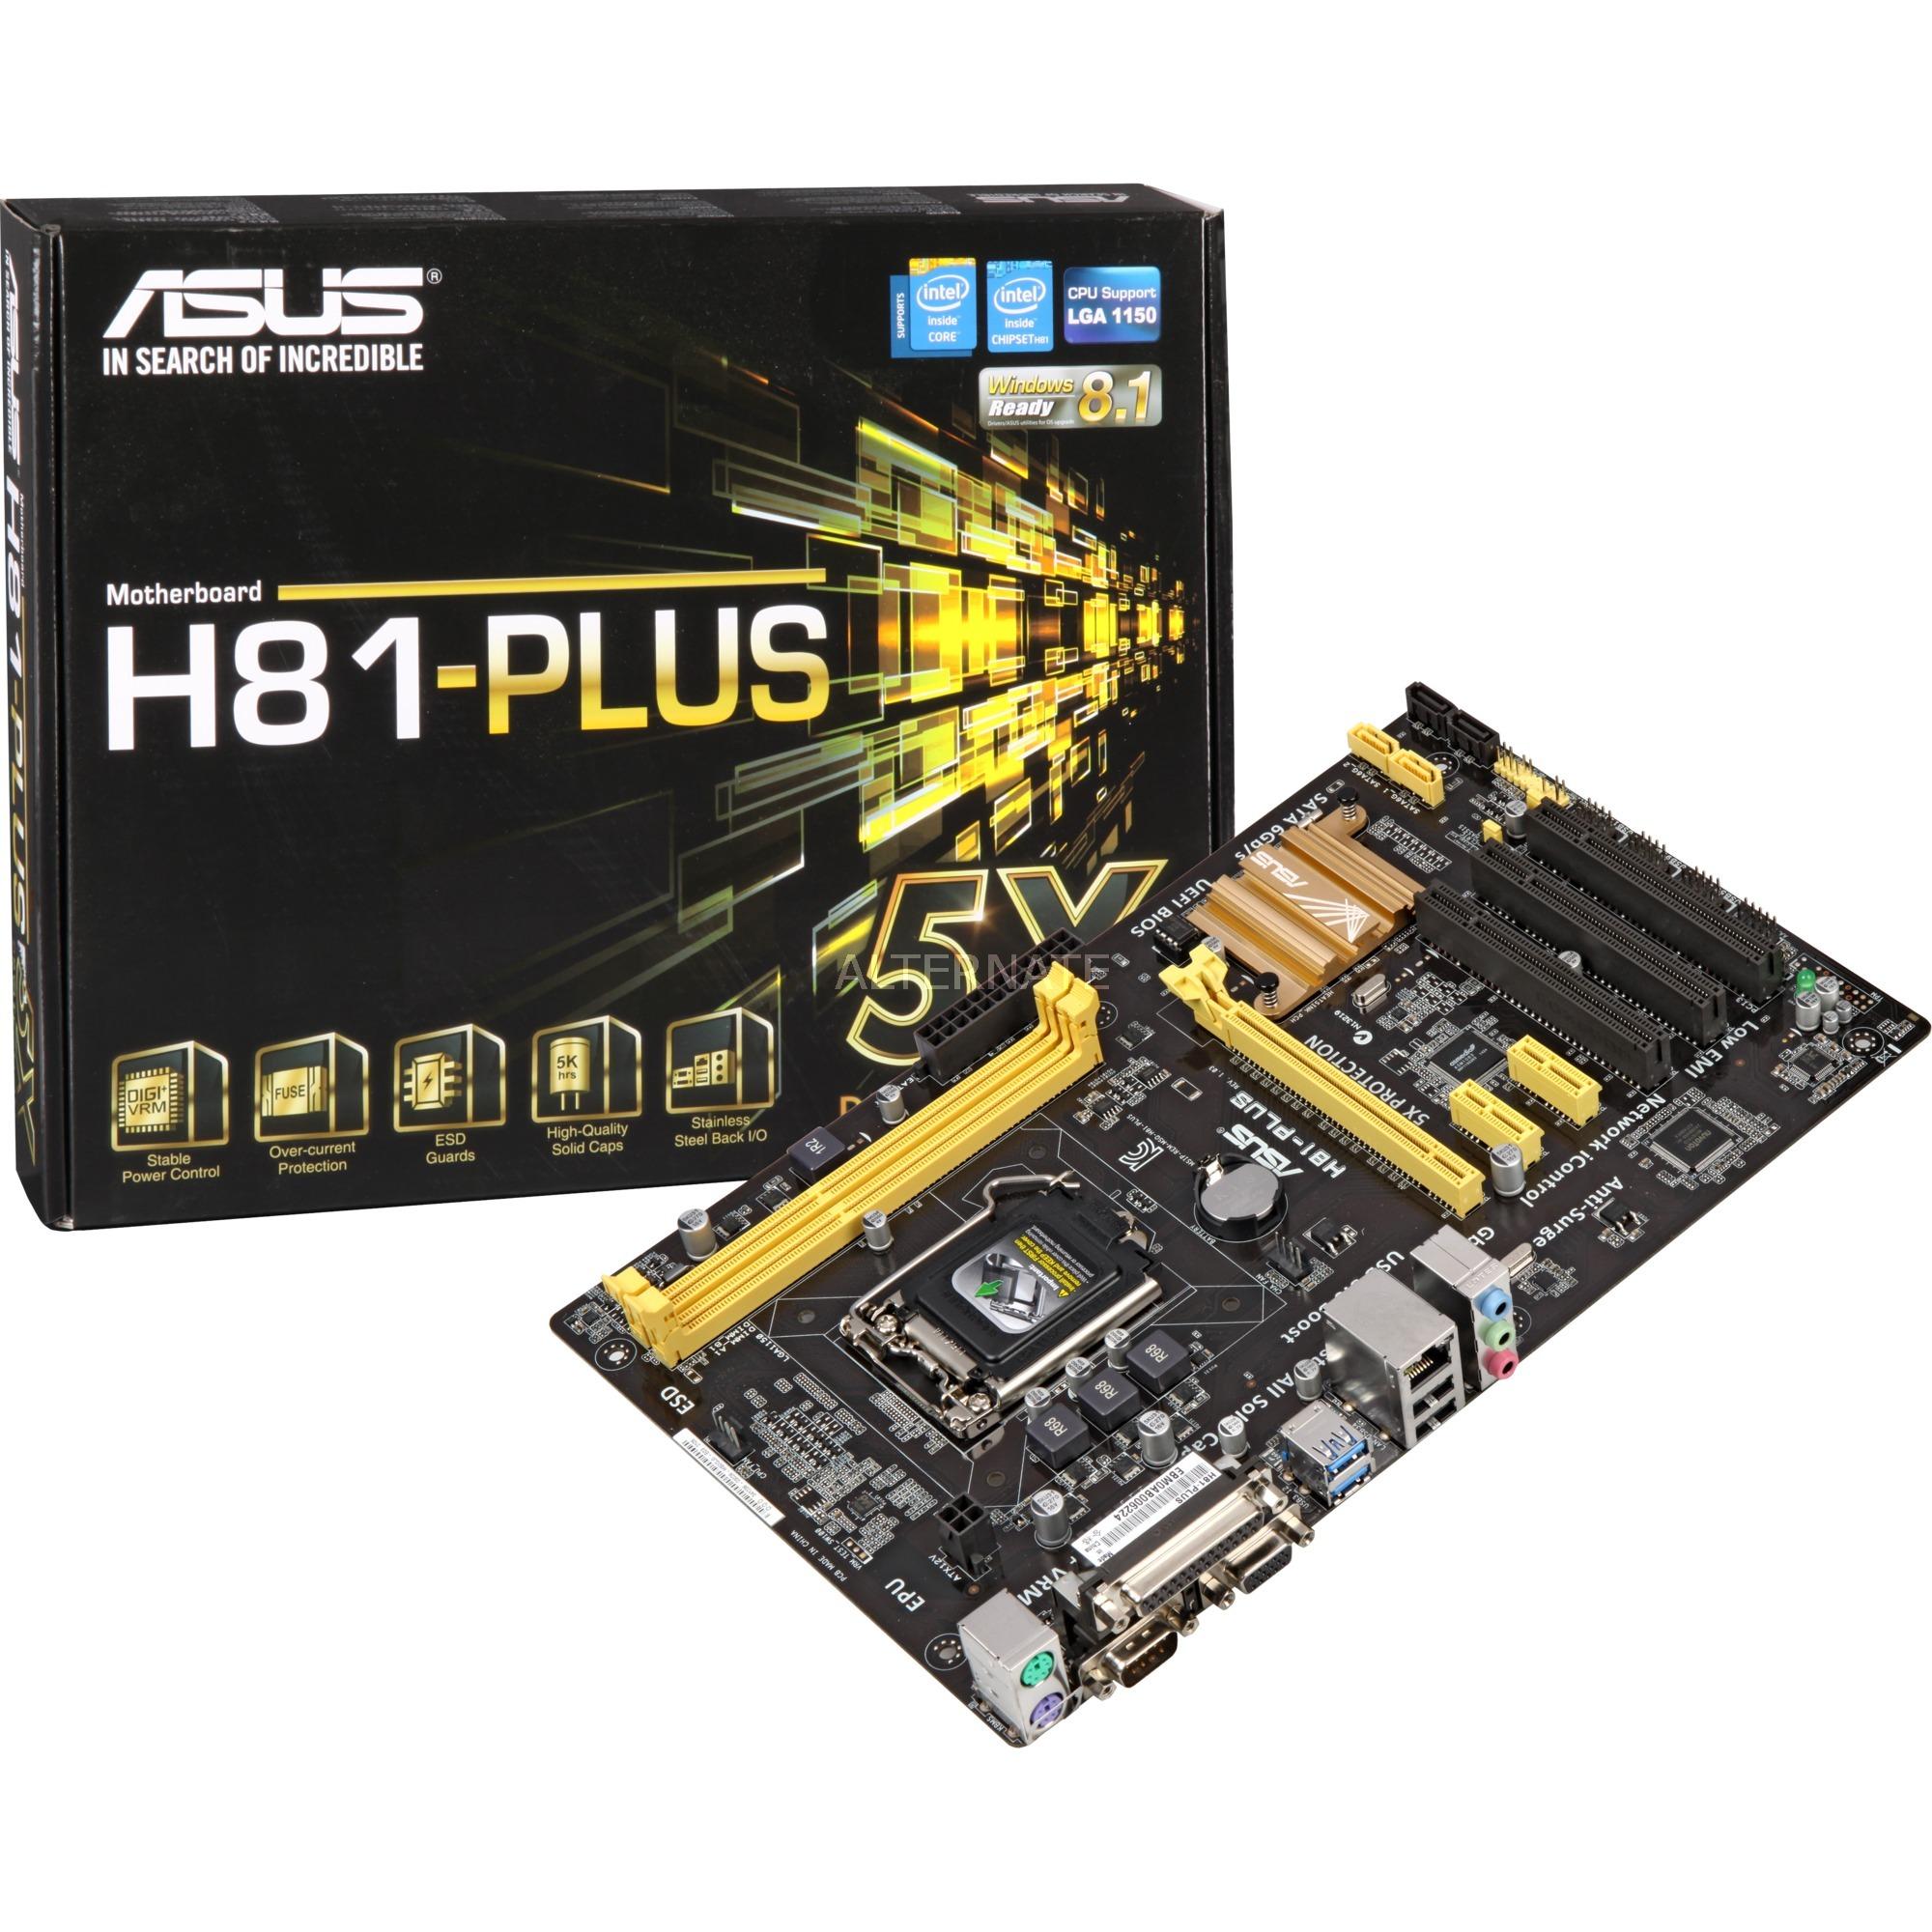 H81-PLUS LGA 1150 (Zócalo H3) Intel H81 ATX, Placa base